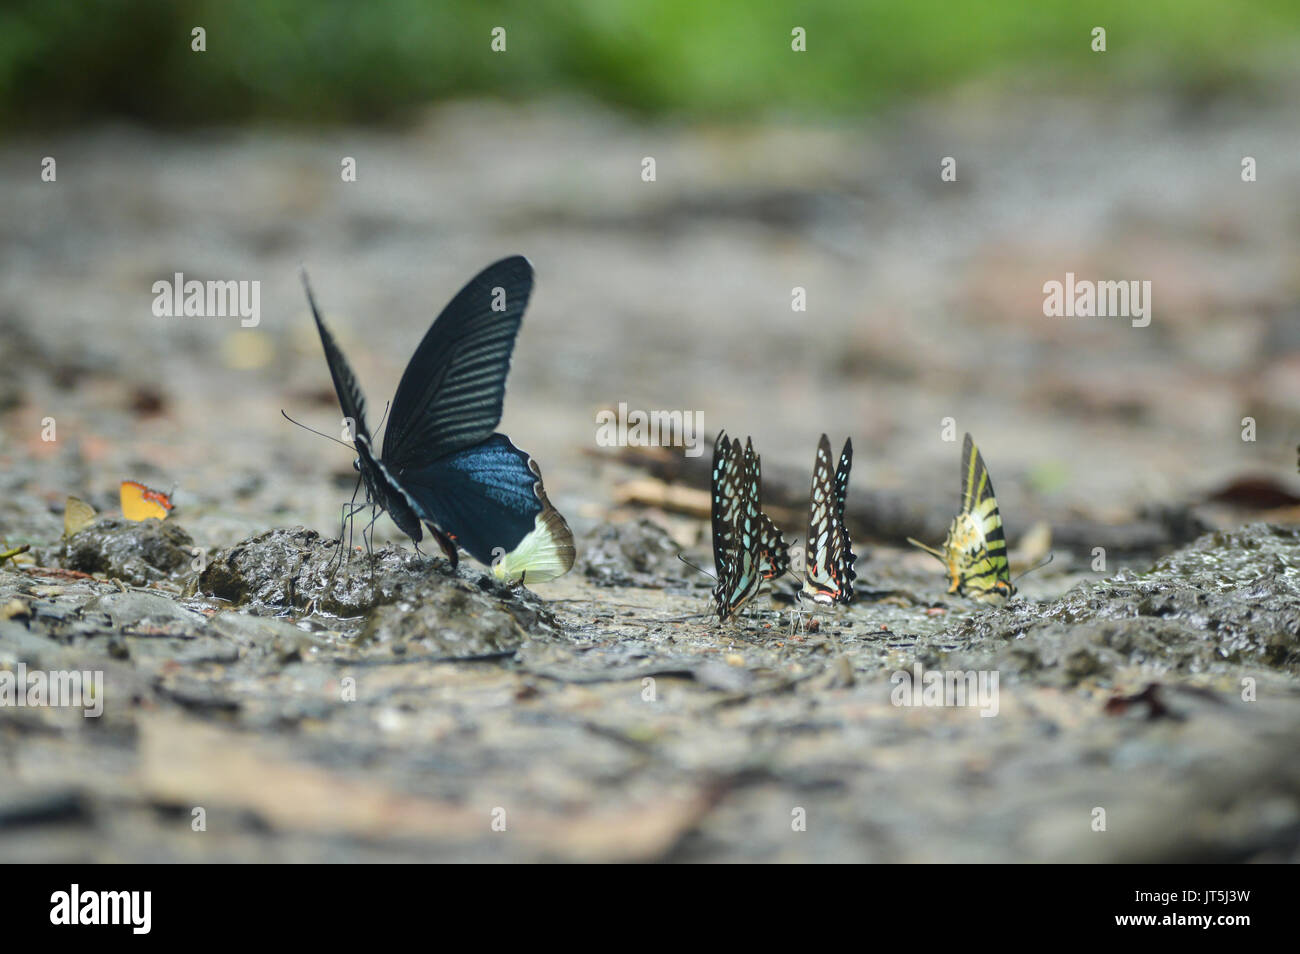 Rare farfalle trovati in Hollongapar gibbone Wildlife Sanctuary, Jorhat, Assam, India. Immagini Stock